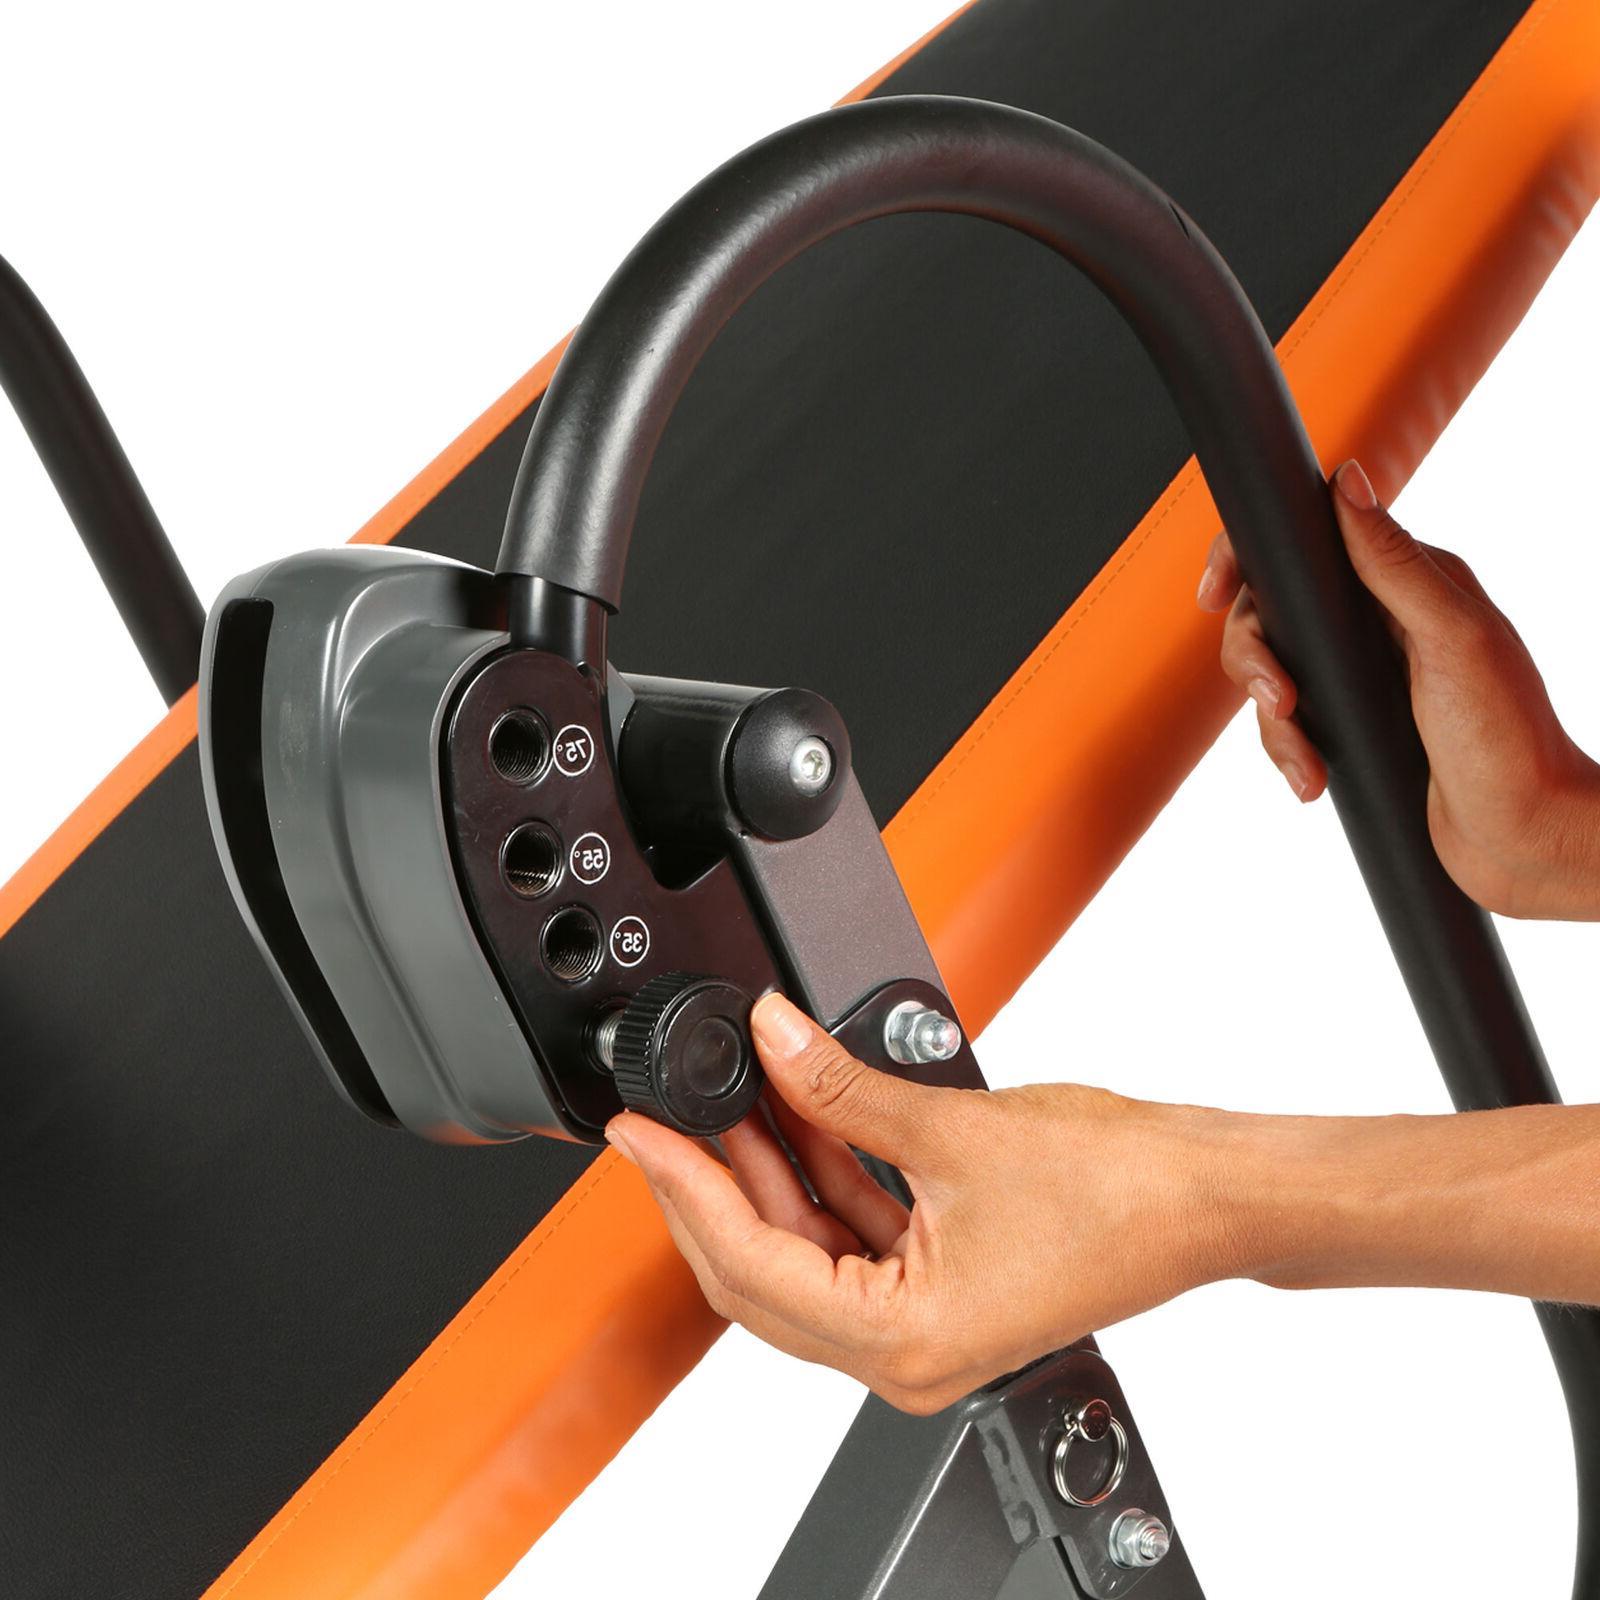 Inversion Table SURELOCK Ratchet Ankle Home Locking